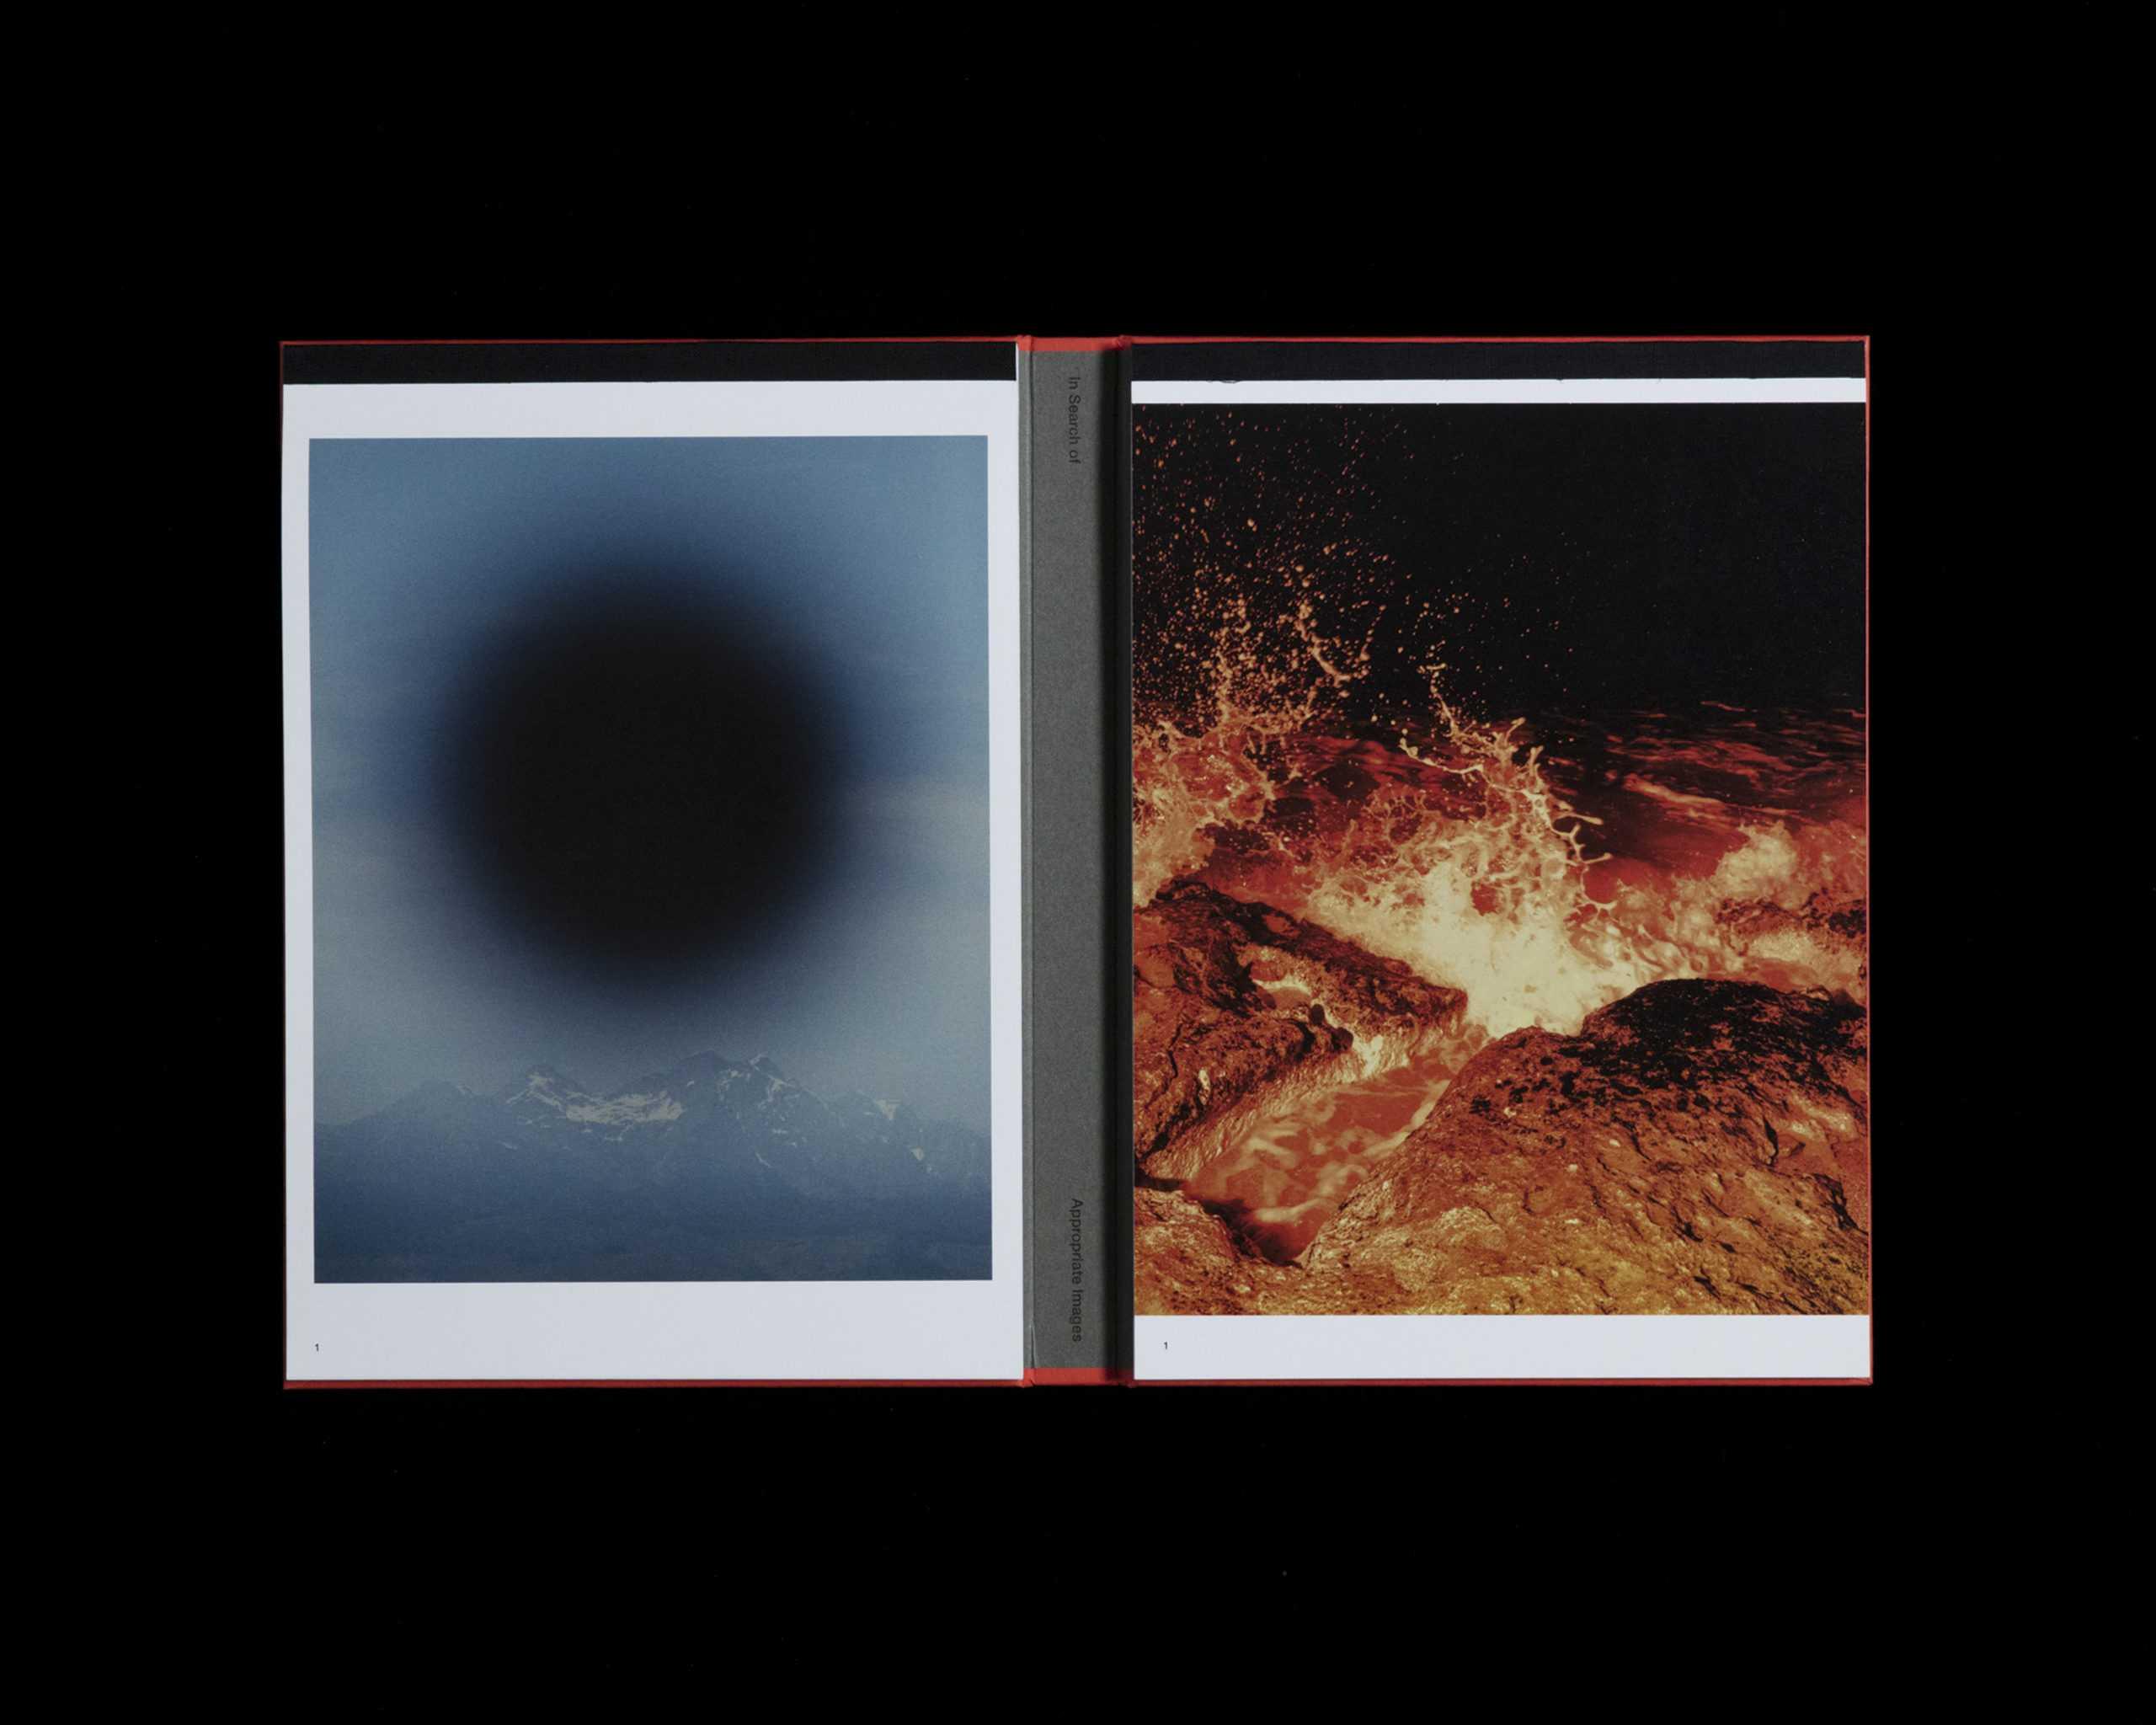 Mattia Balsamini: In Search of Appropriate Images